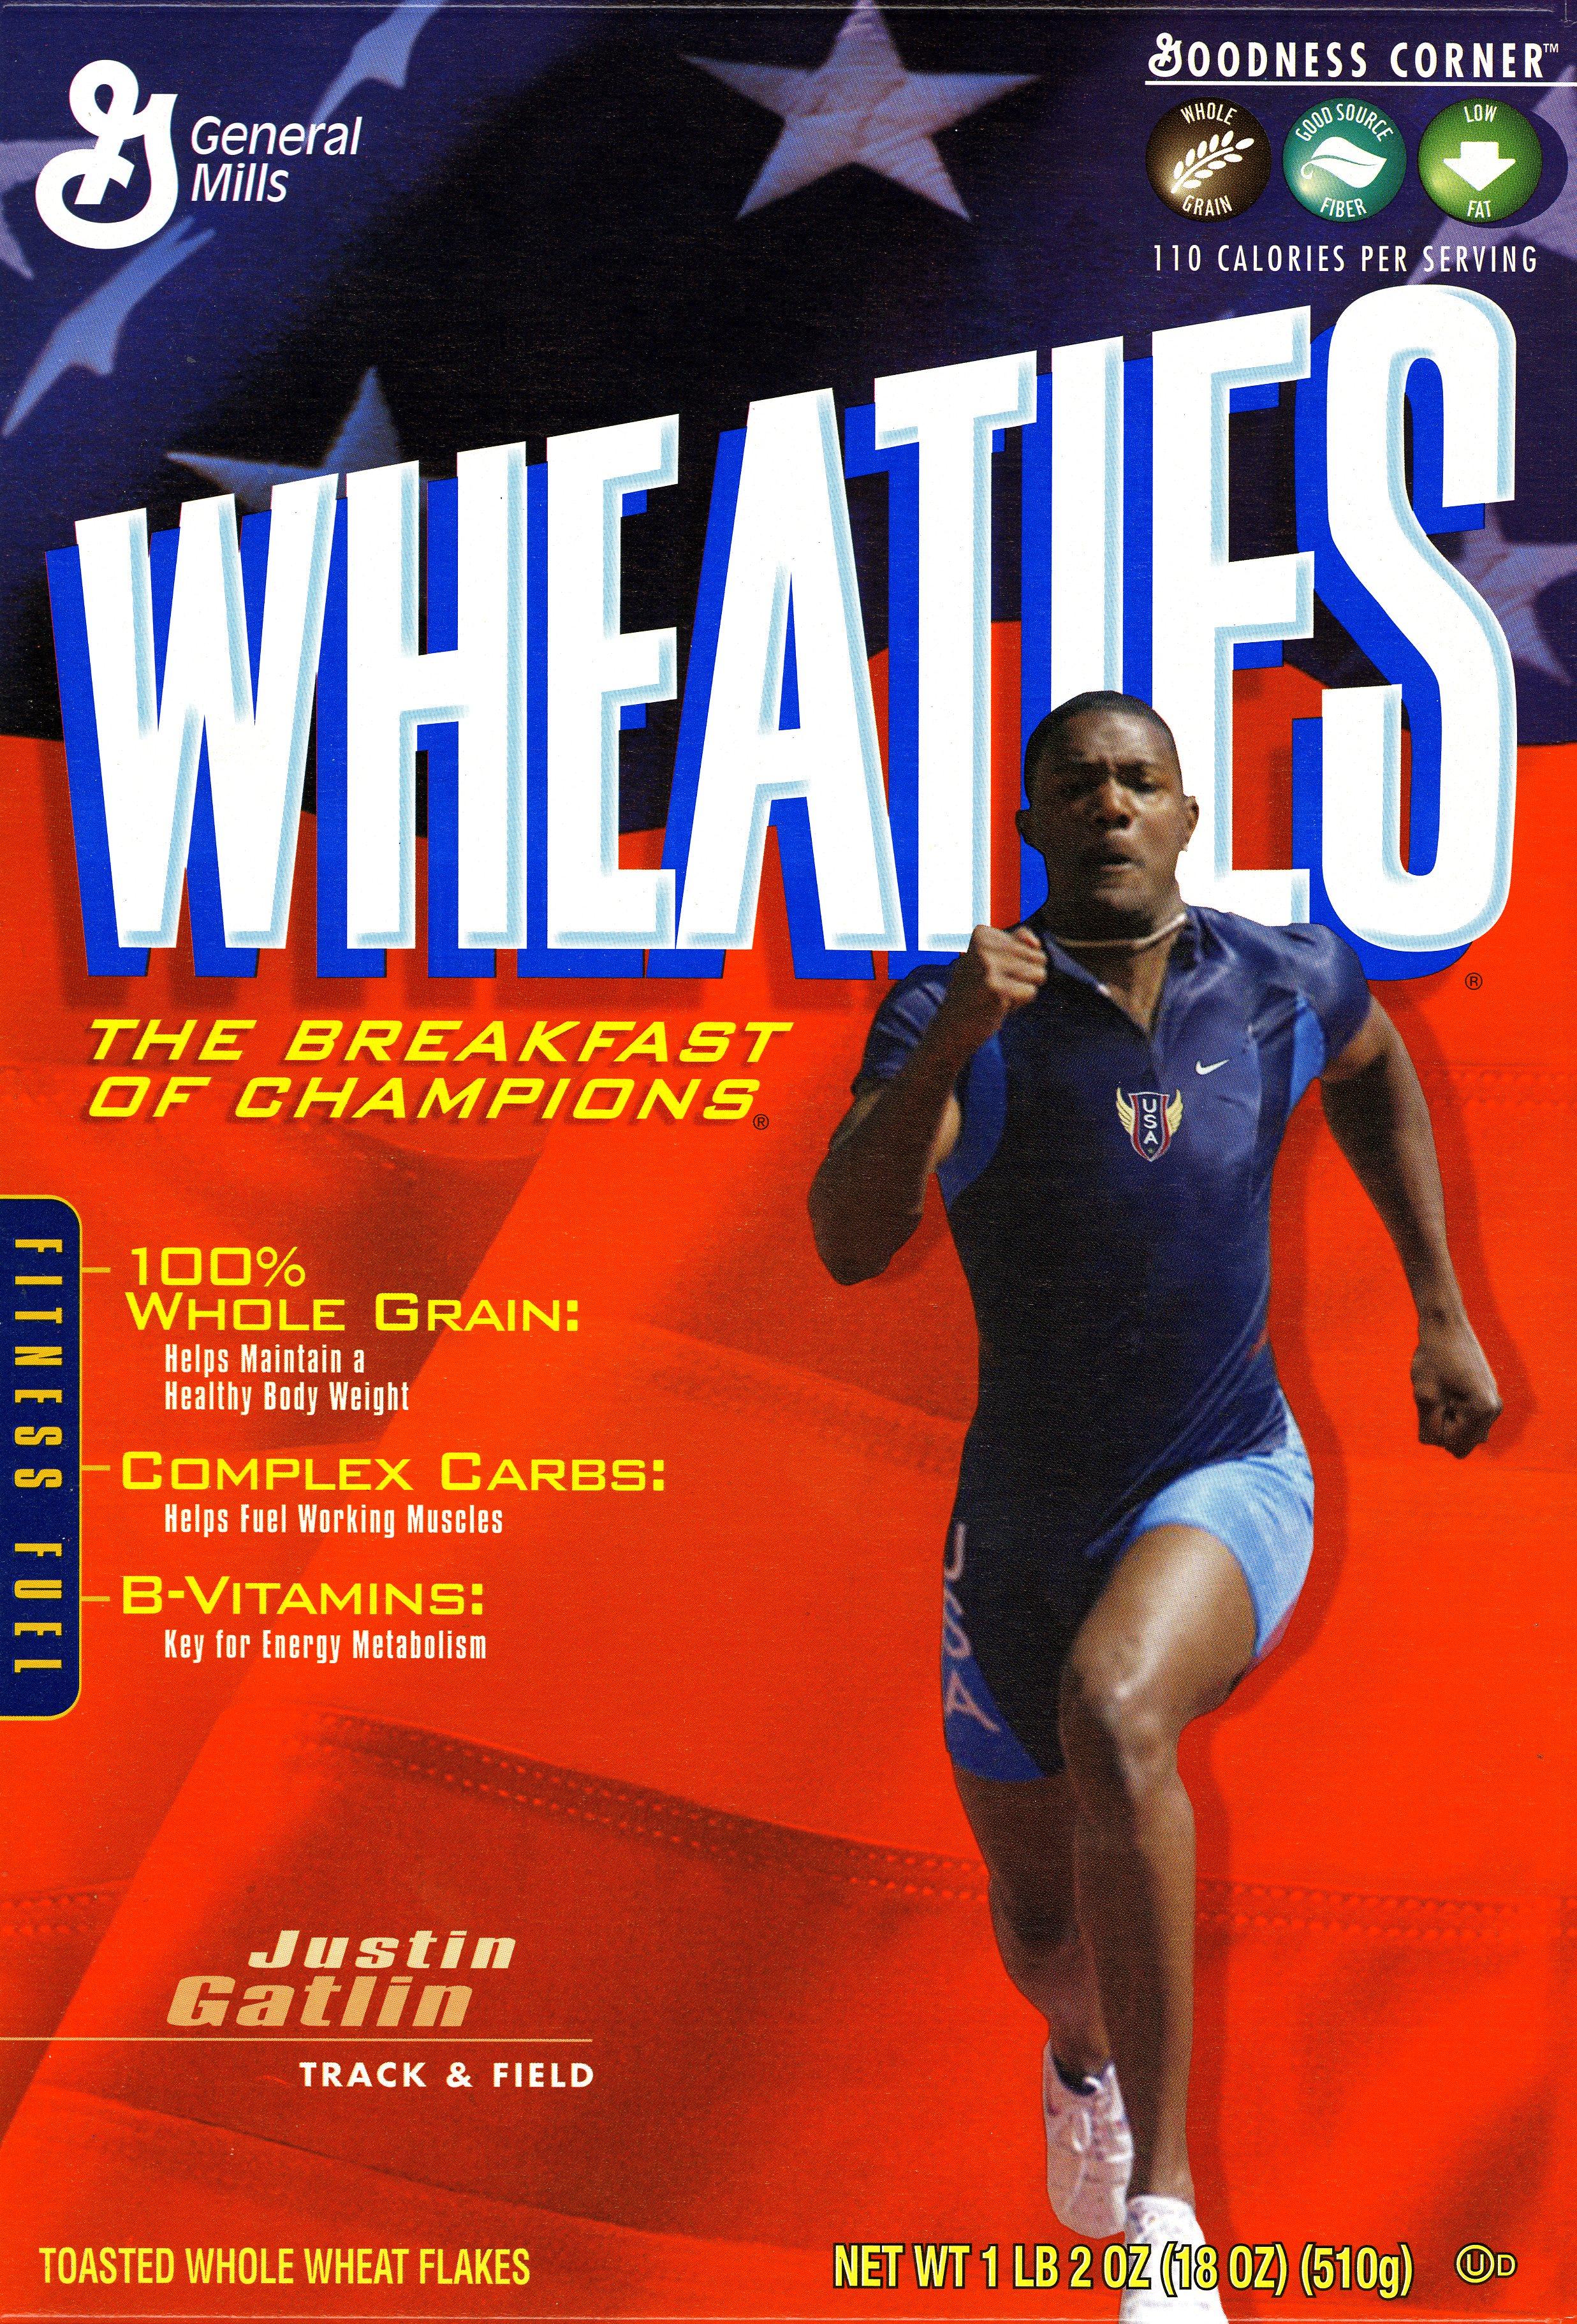 Justin Gatlin on the Wheaties box.